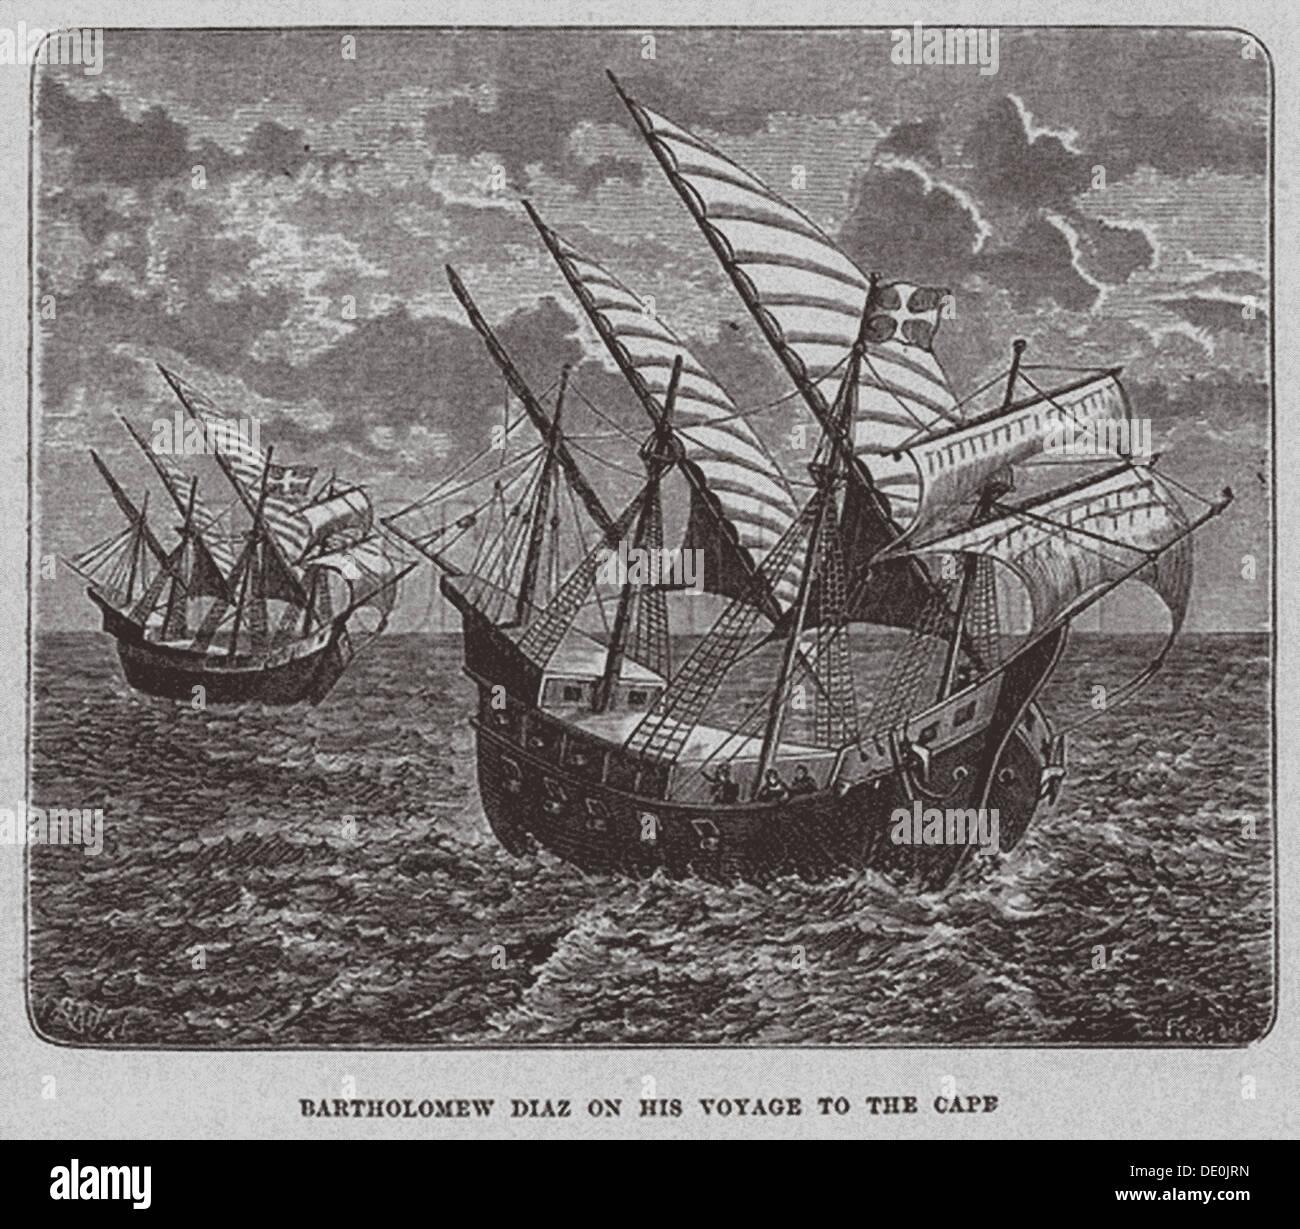 Bartholomew Diaz on his voyage to South Africa, 1878. Artist: Anonymous - Stock Image